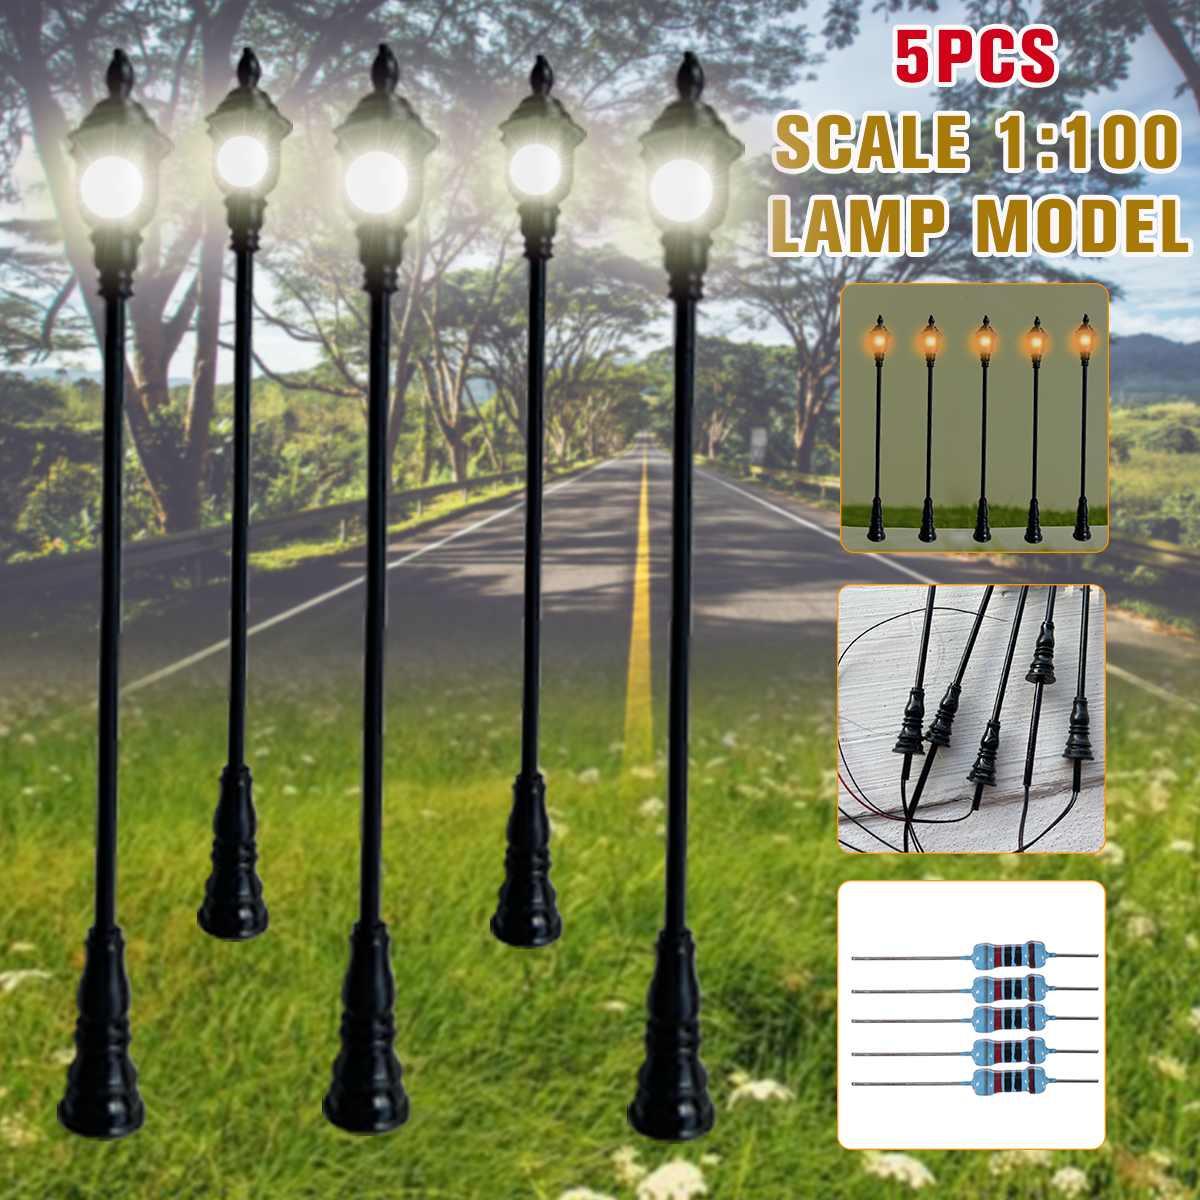 10Pcs Railways Train Models LED Lights Park Garden Lamp Post 1:100 HO Scale